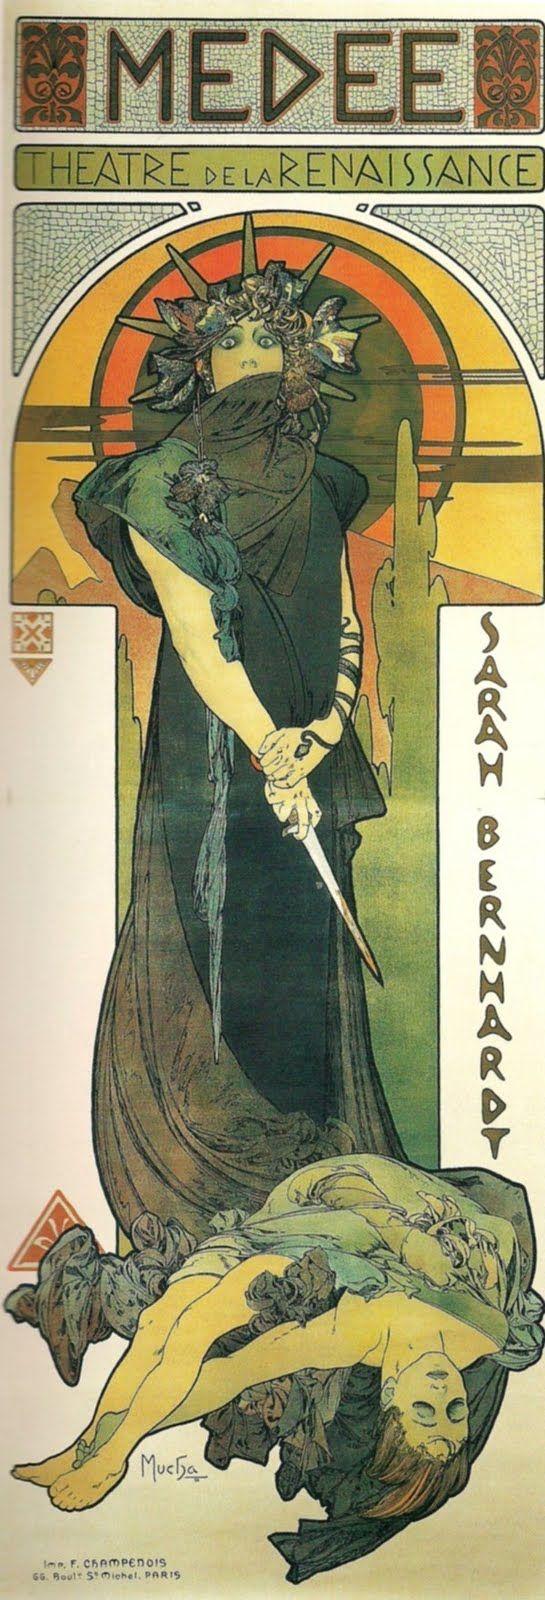 * wunderkammer *: Alphonse Mucha & Sarah Bernhardt: Estética Art Nouveau / Art Nouveau aesthetic